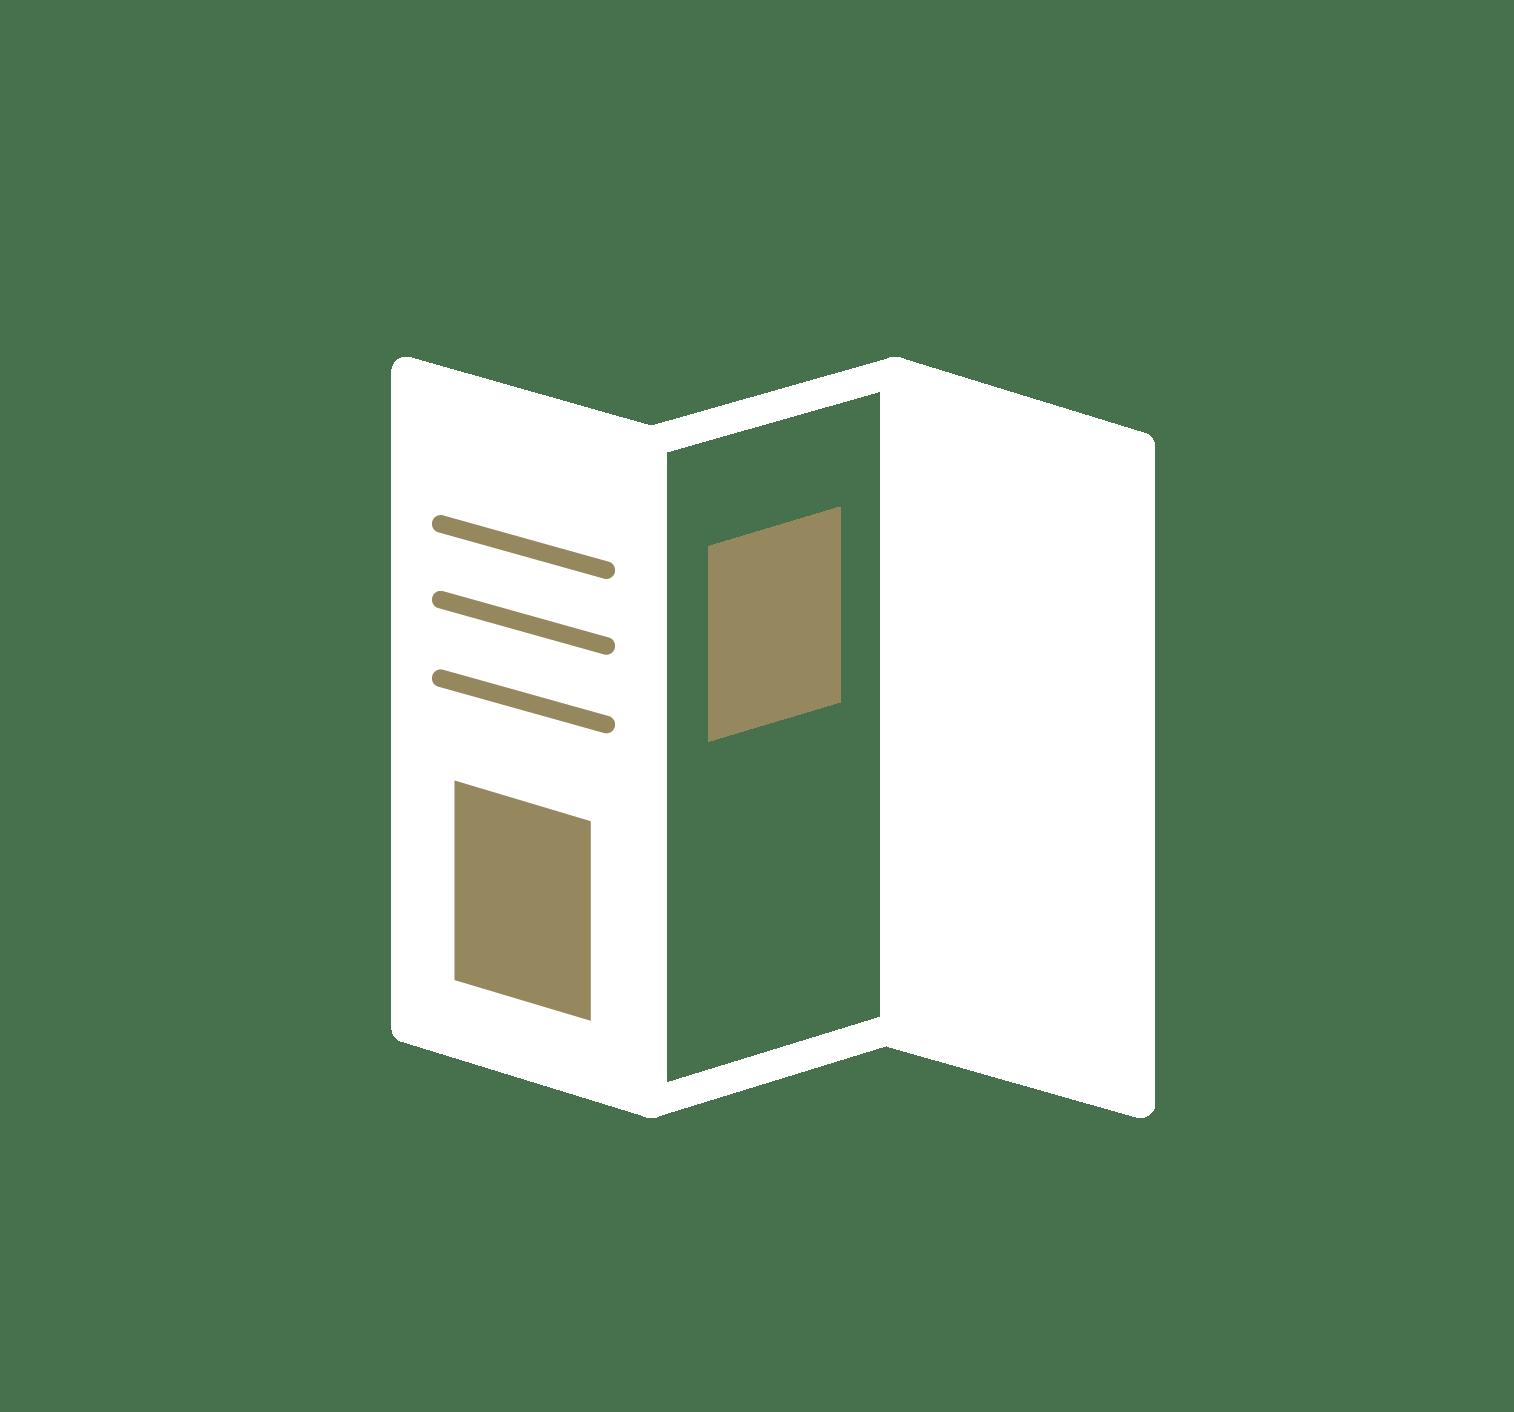 agence-écho—agence-de-communication-07